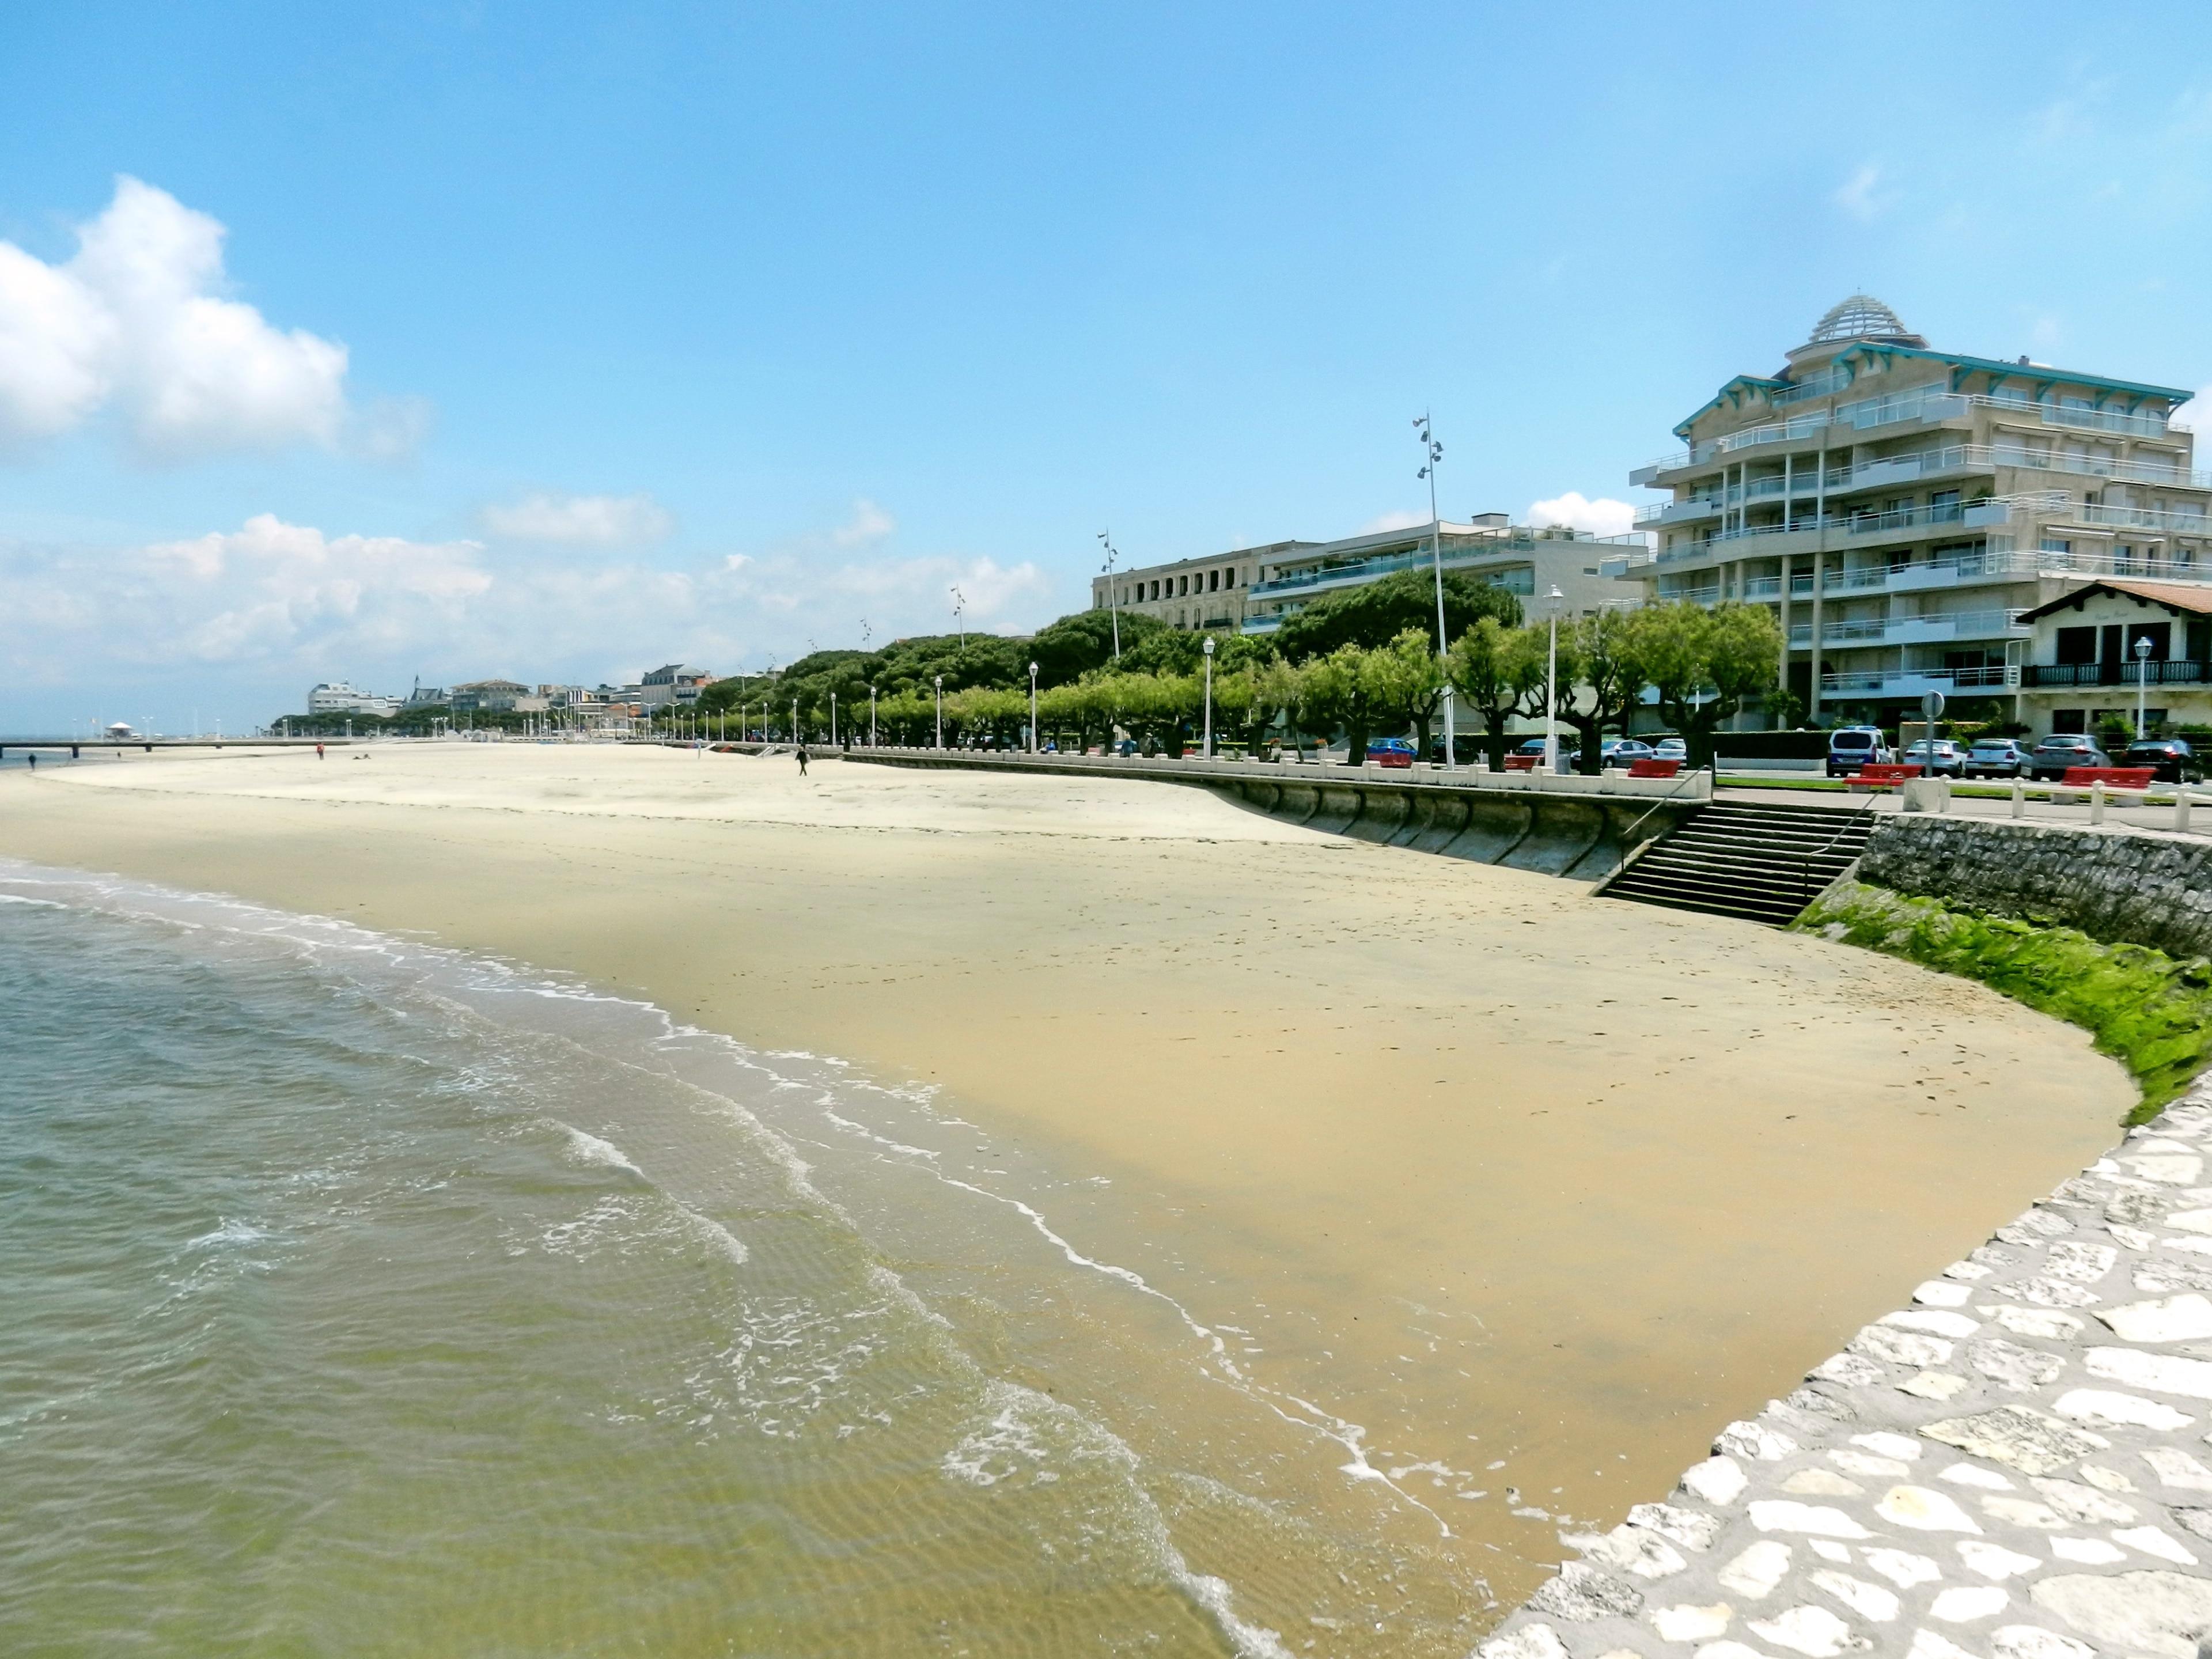 Arcachon Beach, Arcachon, France